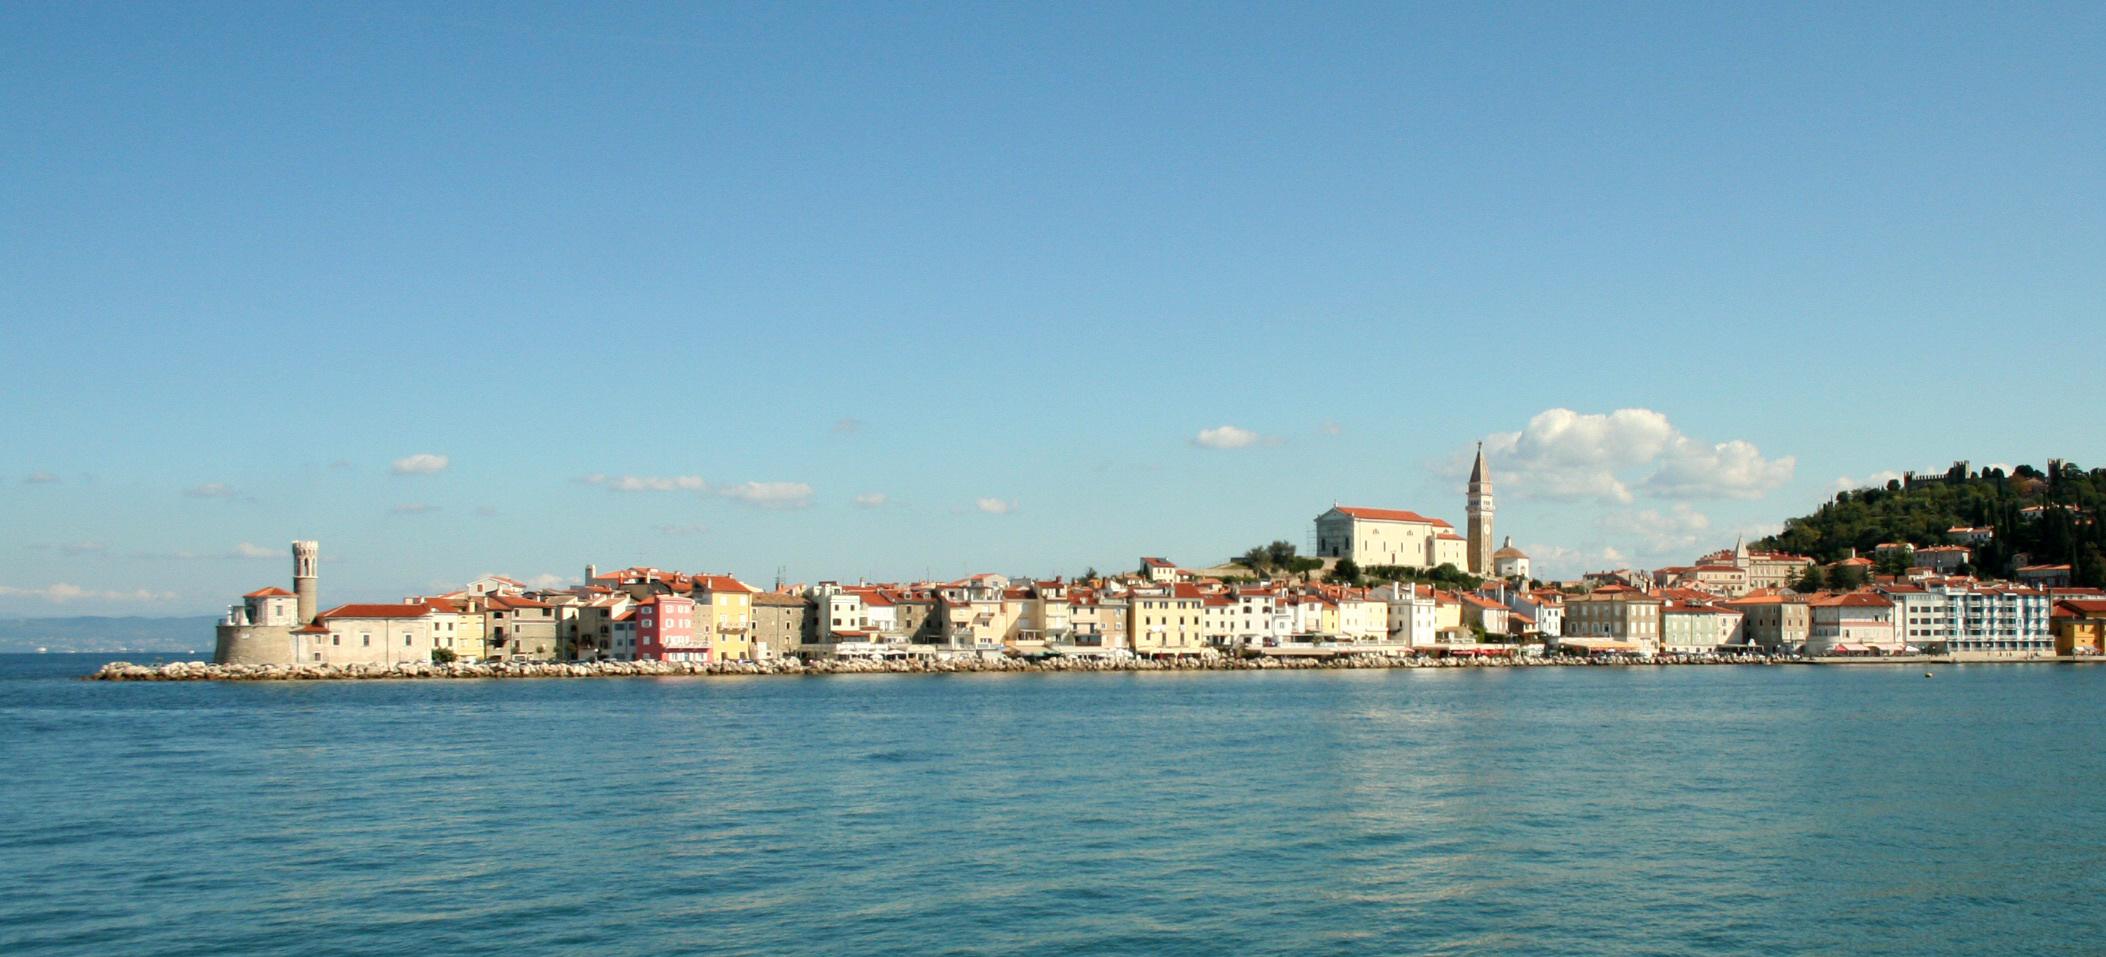 Slovenian coast anticipating good summer season